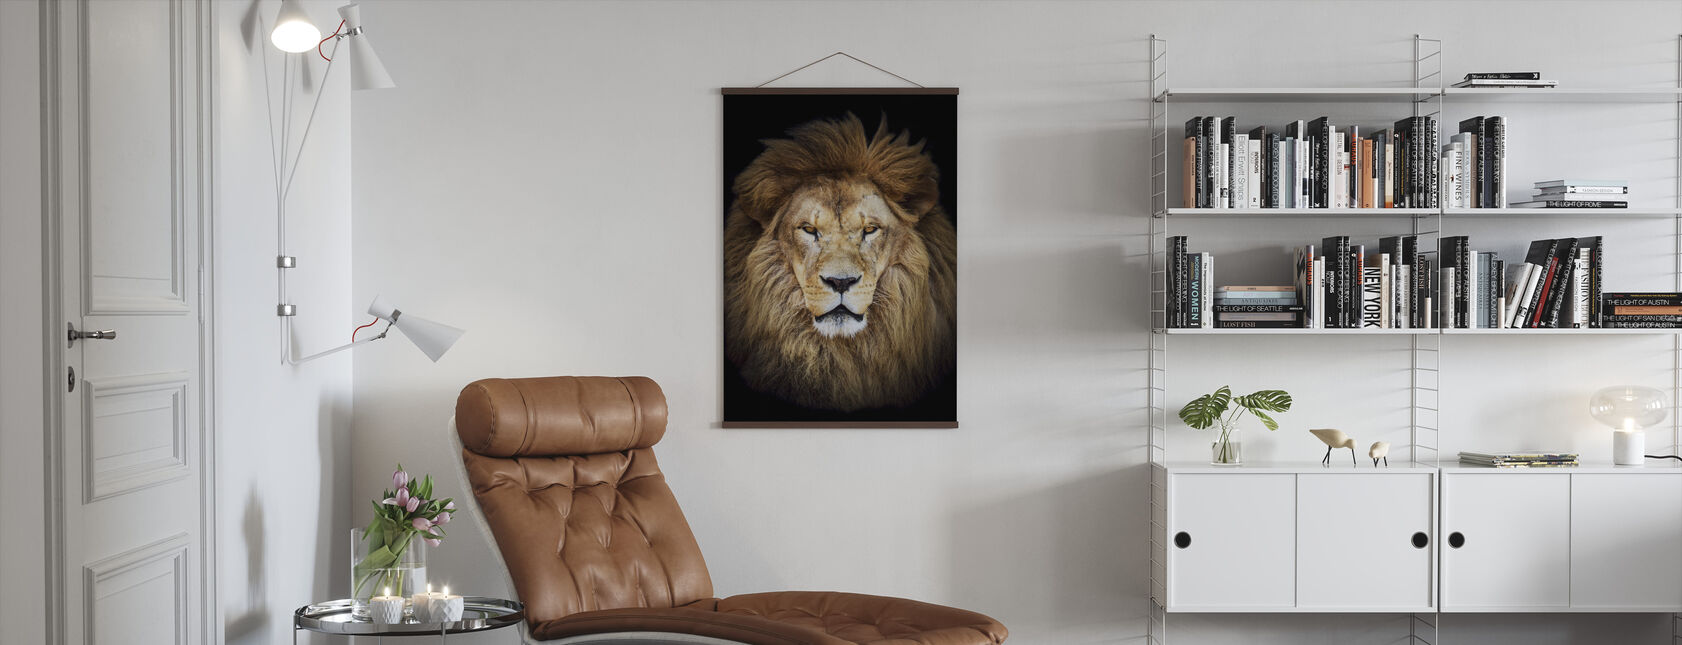 Majestätisk lejon - Poster - Vardagsrum